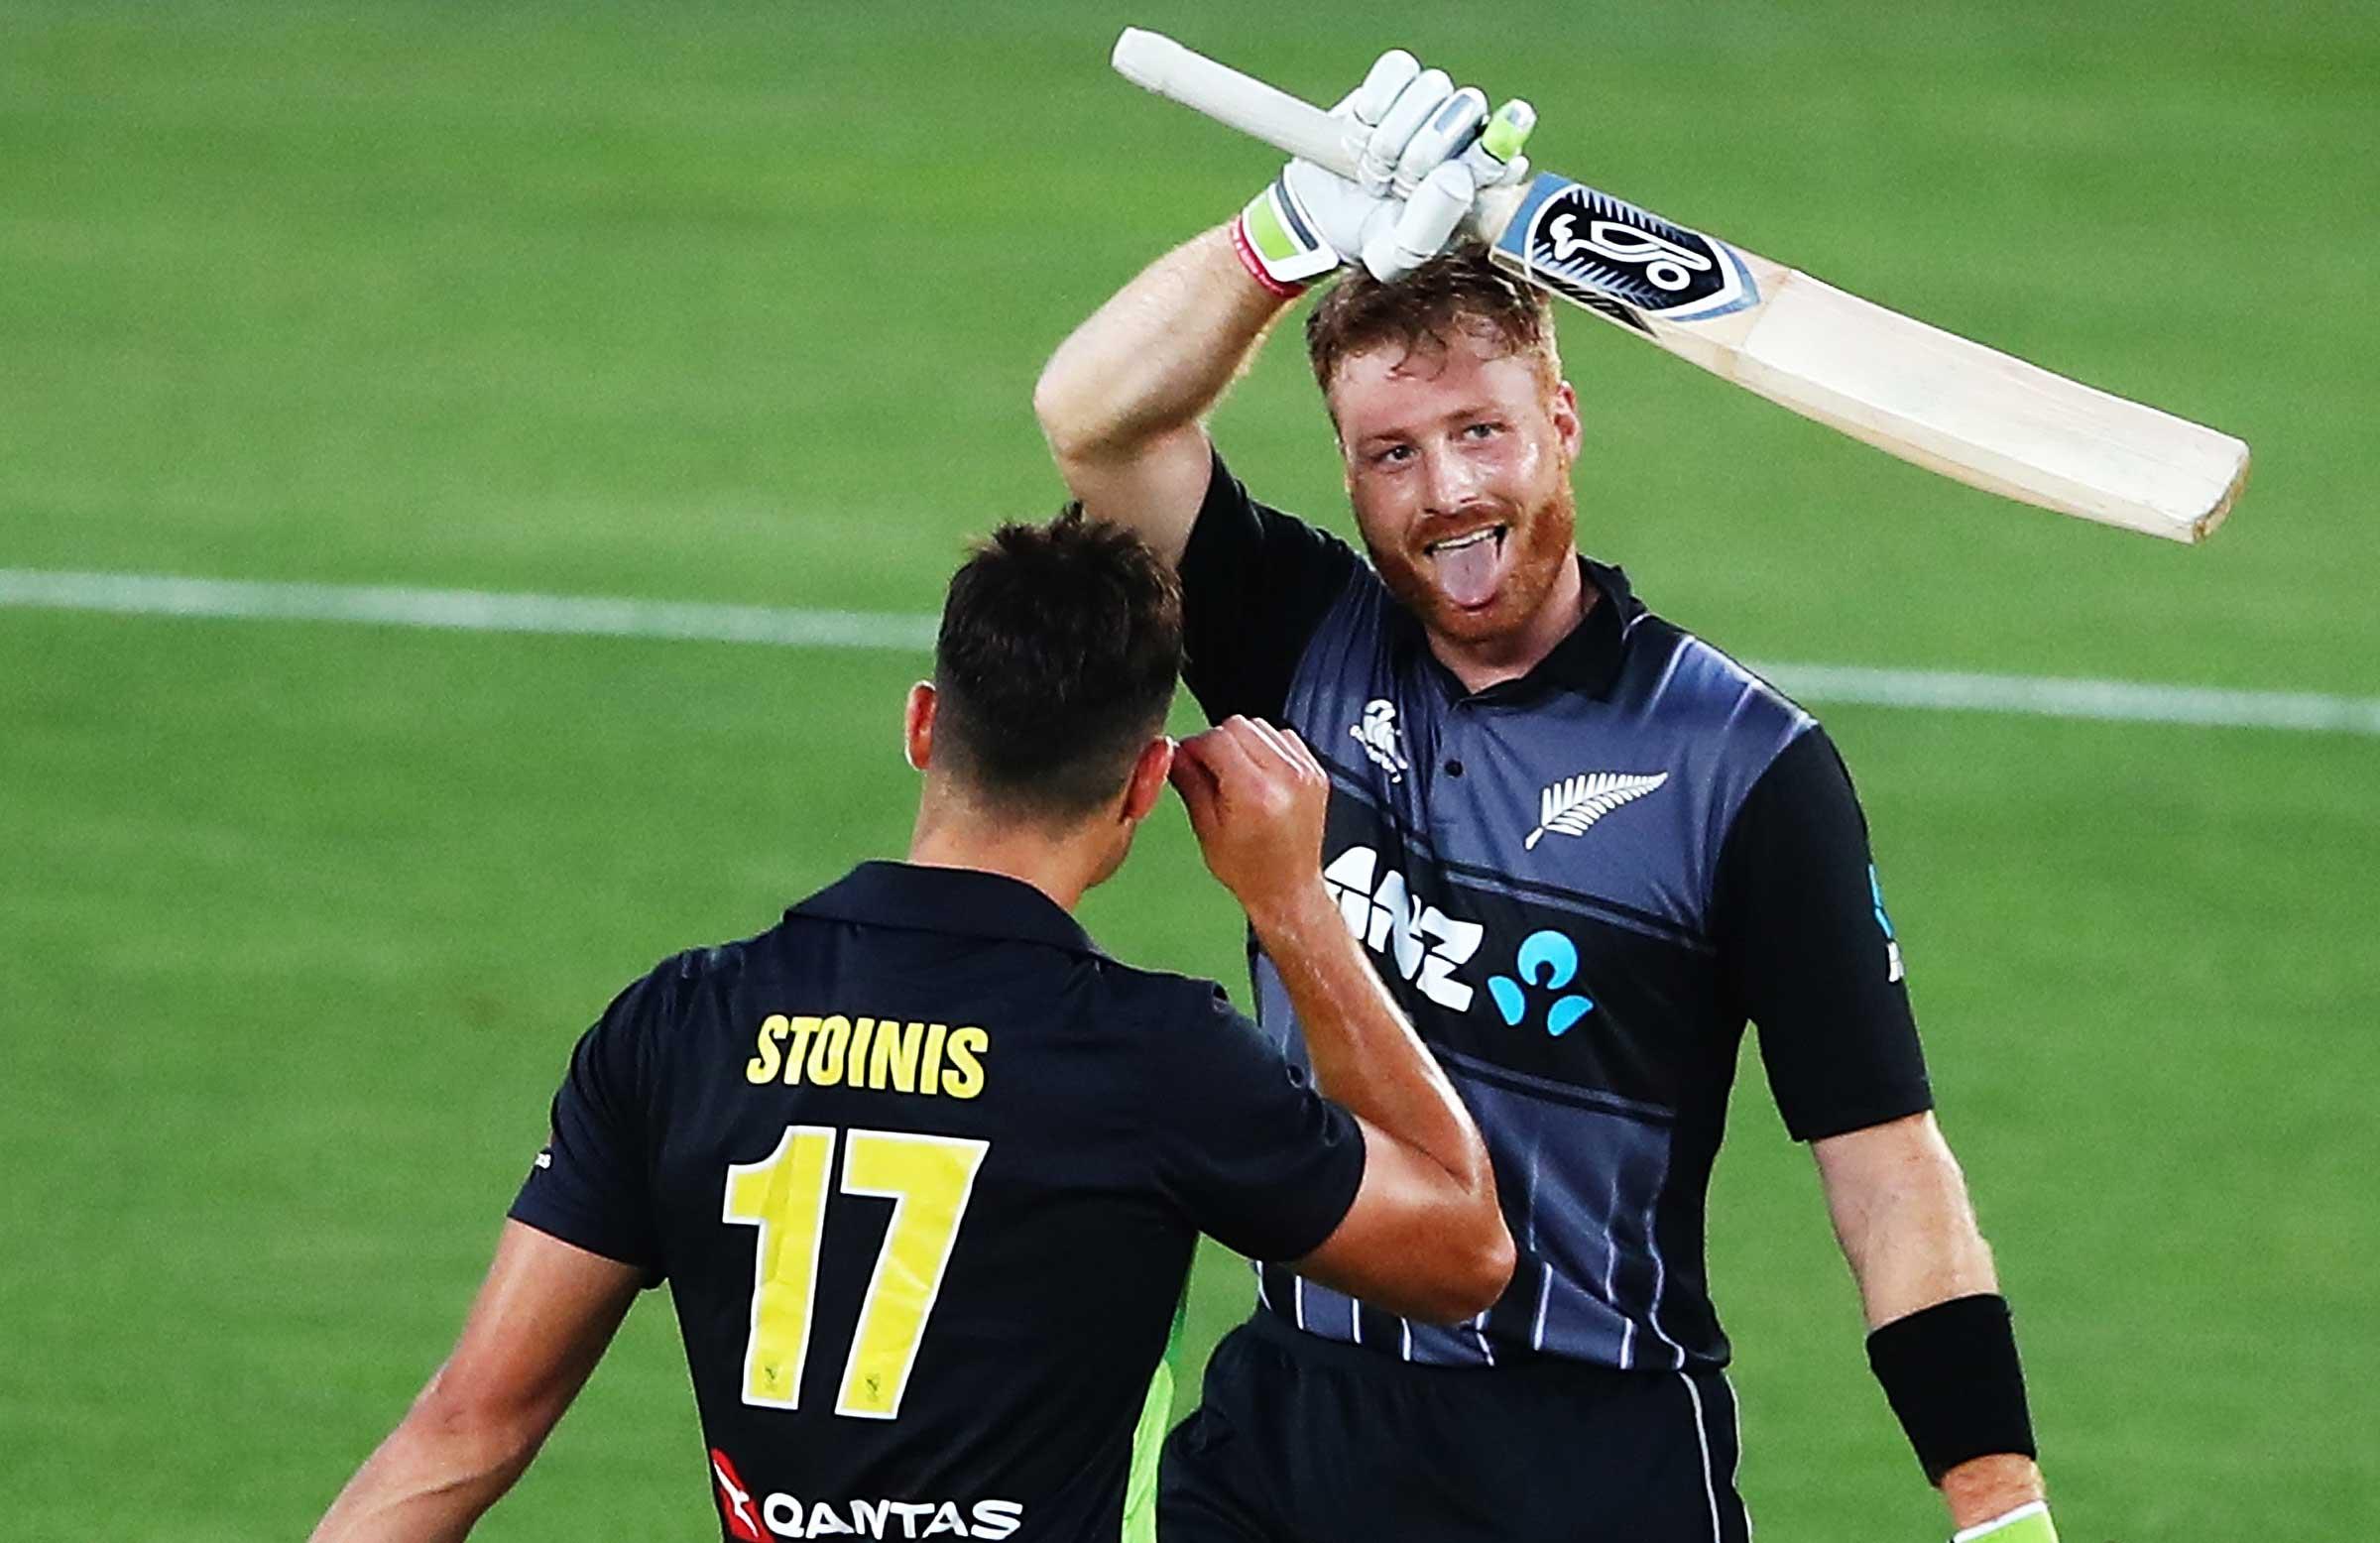 Martin Guptill slams quickest T20 ton by a Kiwi batsman, Twitter celebrates